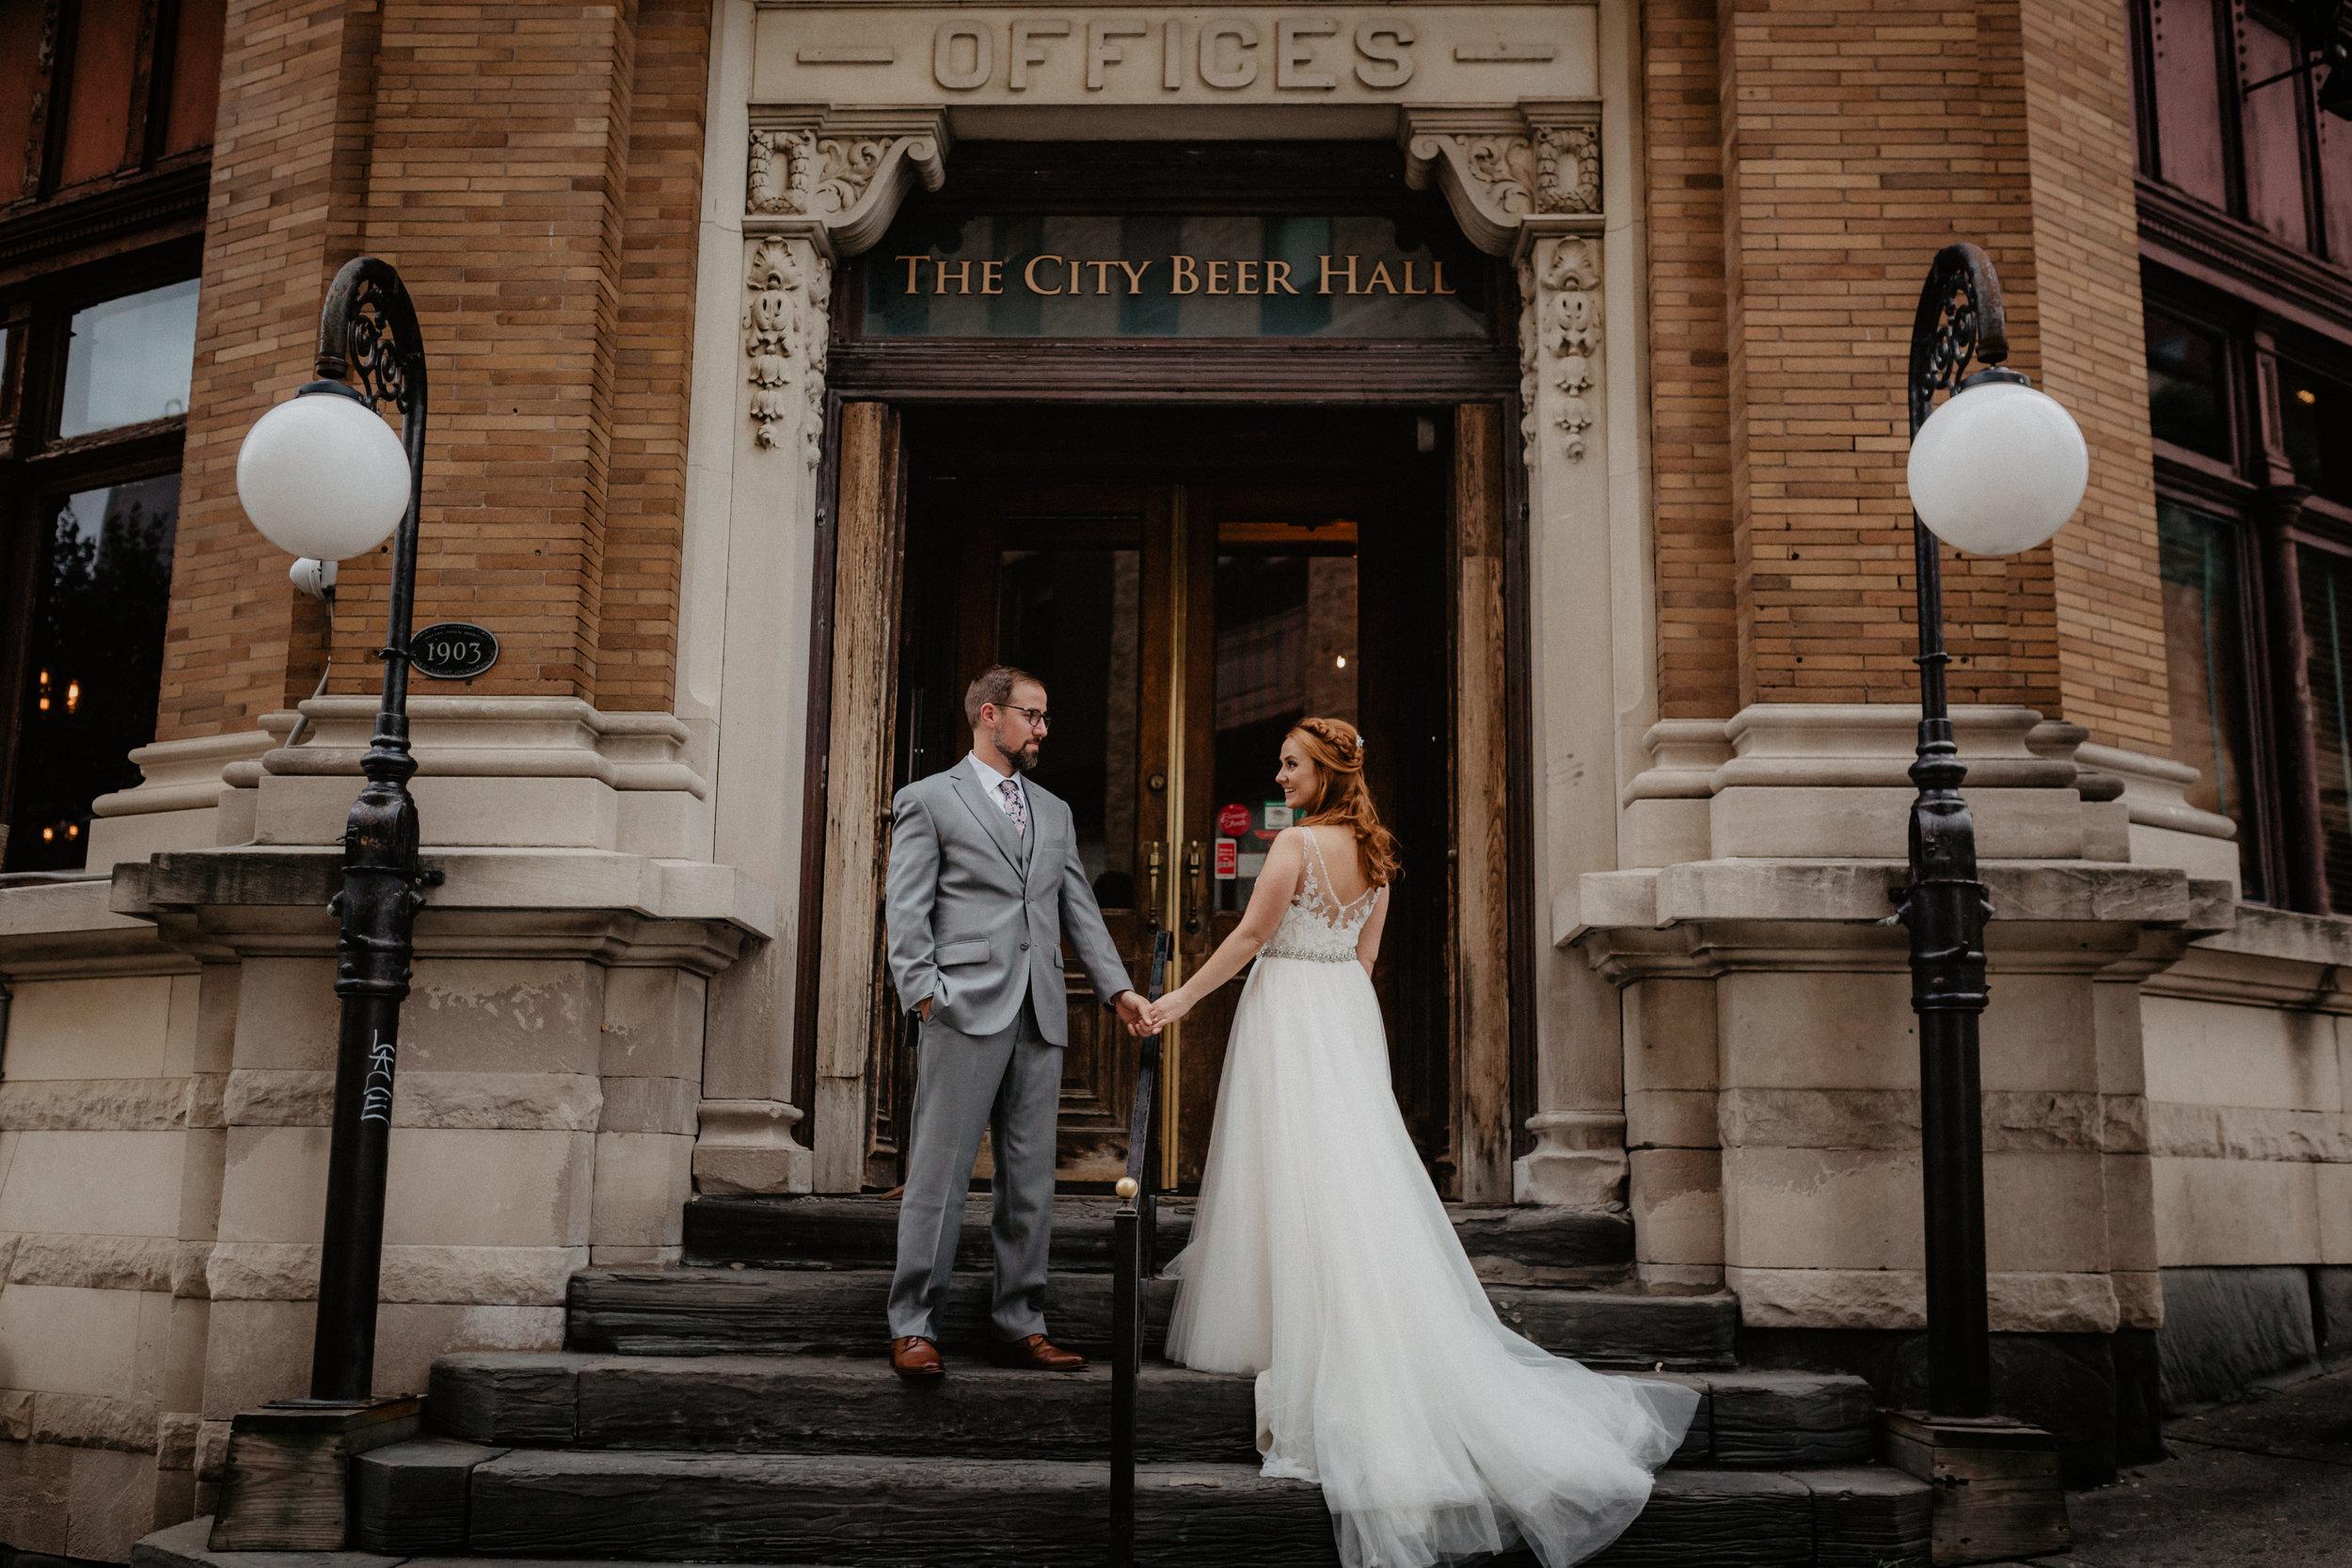 city-beer-hall-wedding-1-2.jpg